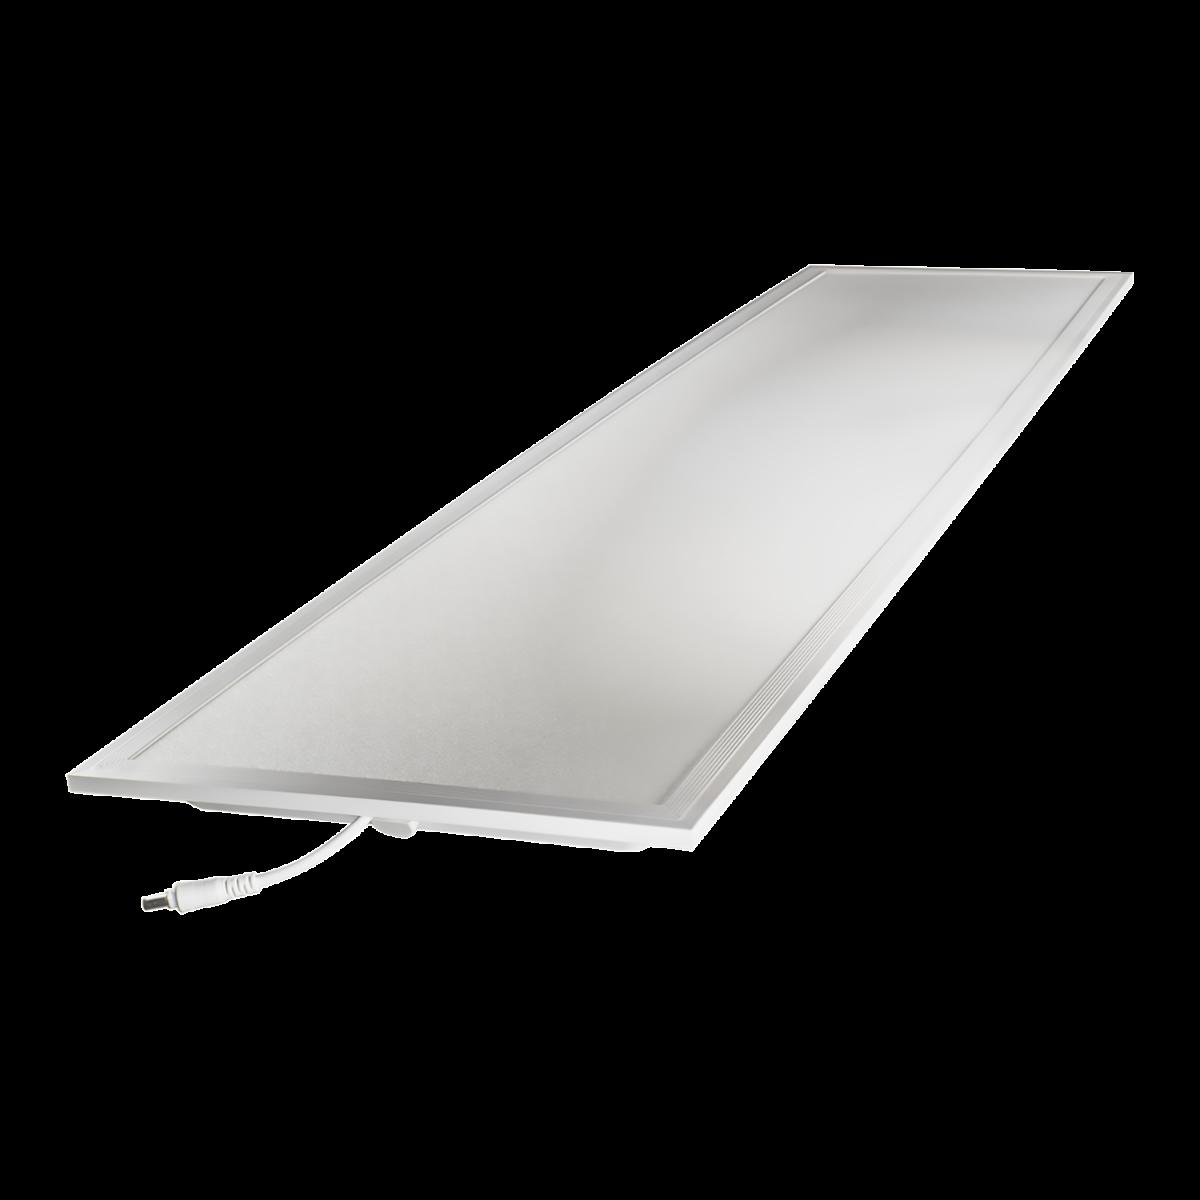 Noxion Panel LED Delta Pro Highlum V2.0 40W 30x120cm 3000K 5280lm UGR <19 | Luz Cálida - Reemplazo 2x36W